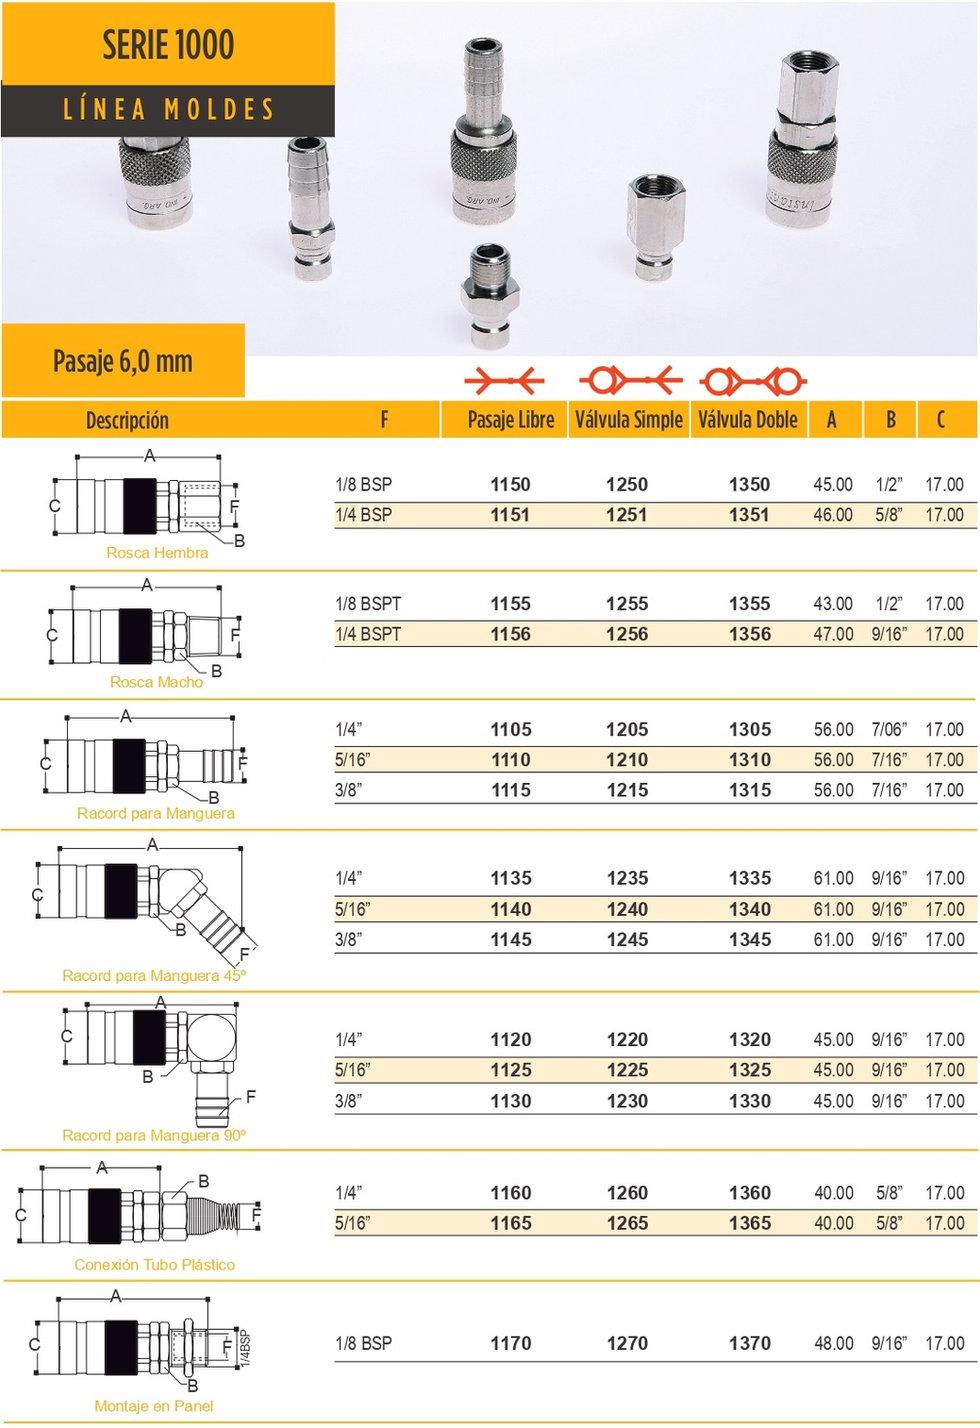 13- PAG SERIE 1000 - 1.jpg